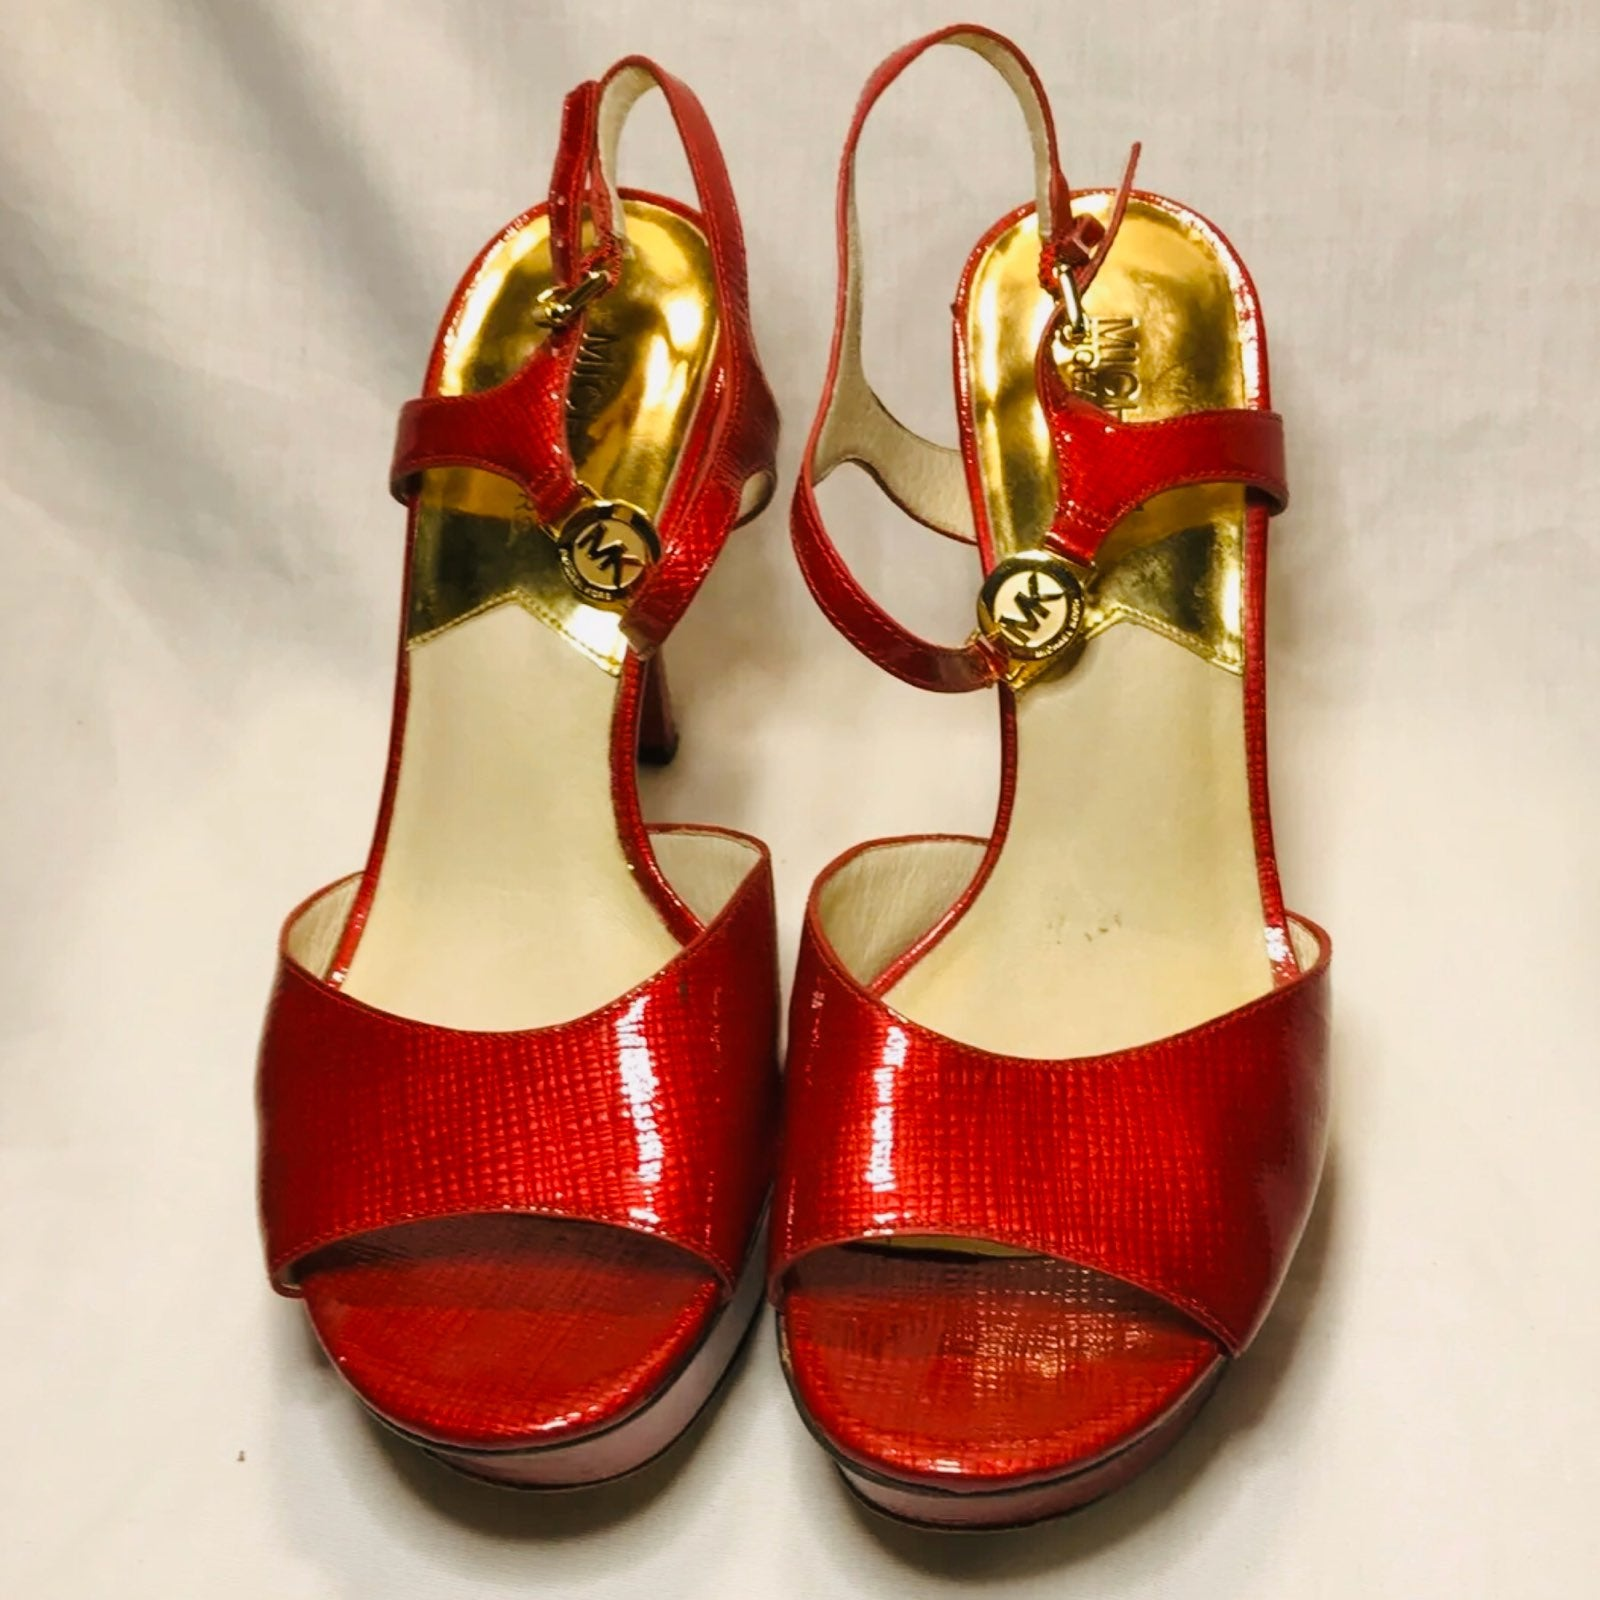 Michael kors size 8 Heels womens